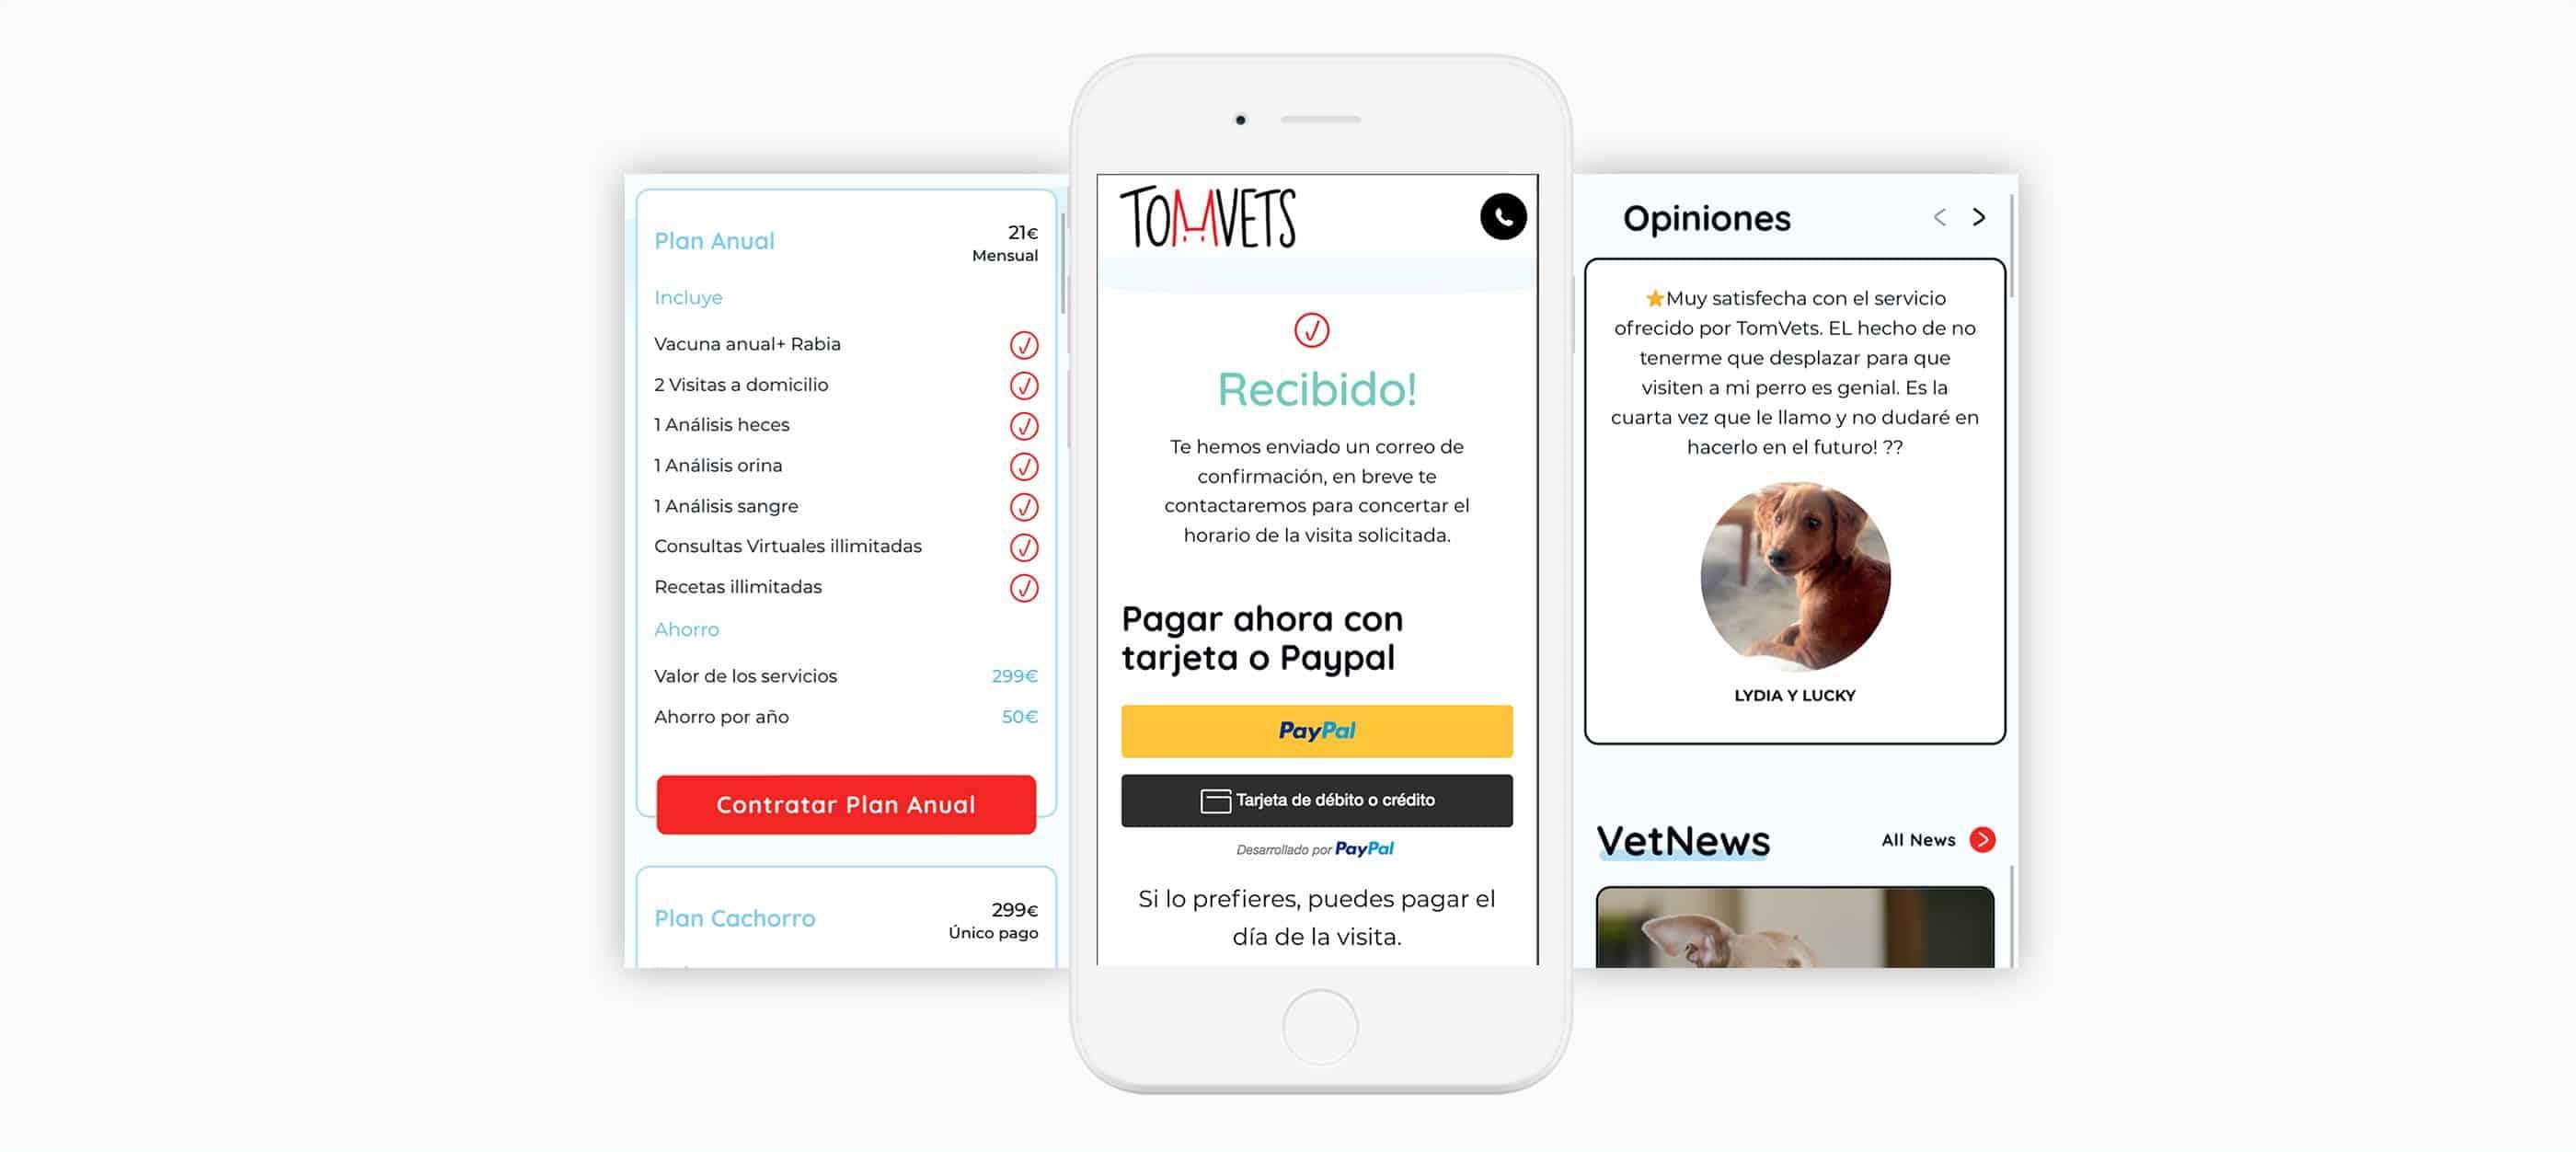 tomvets website responive design